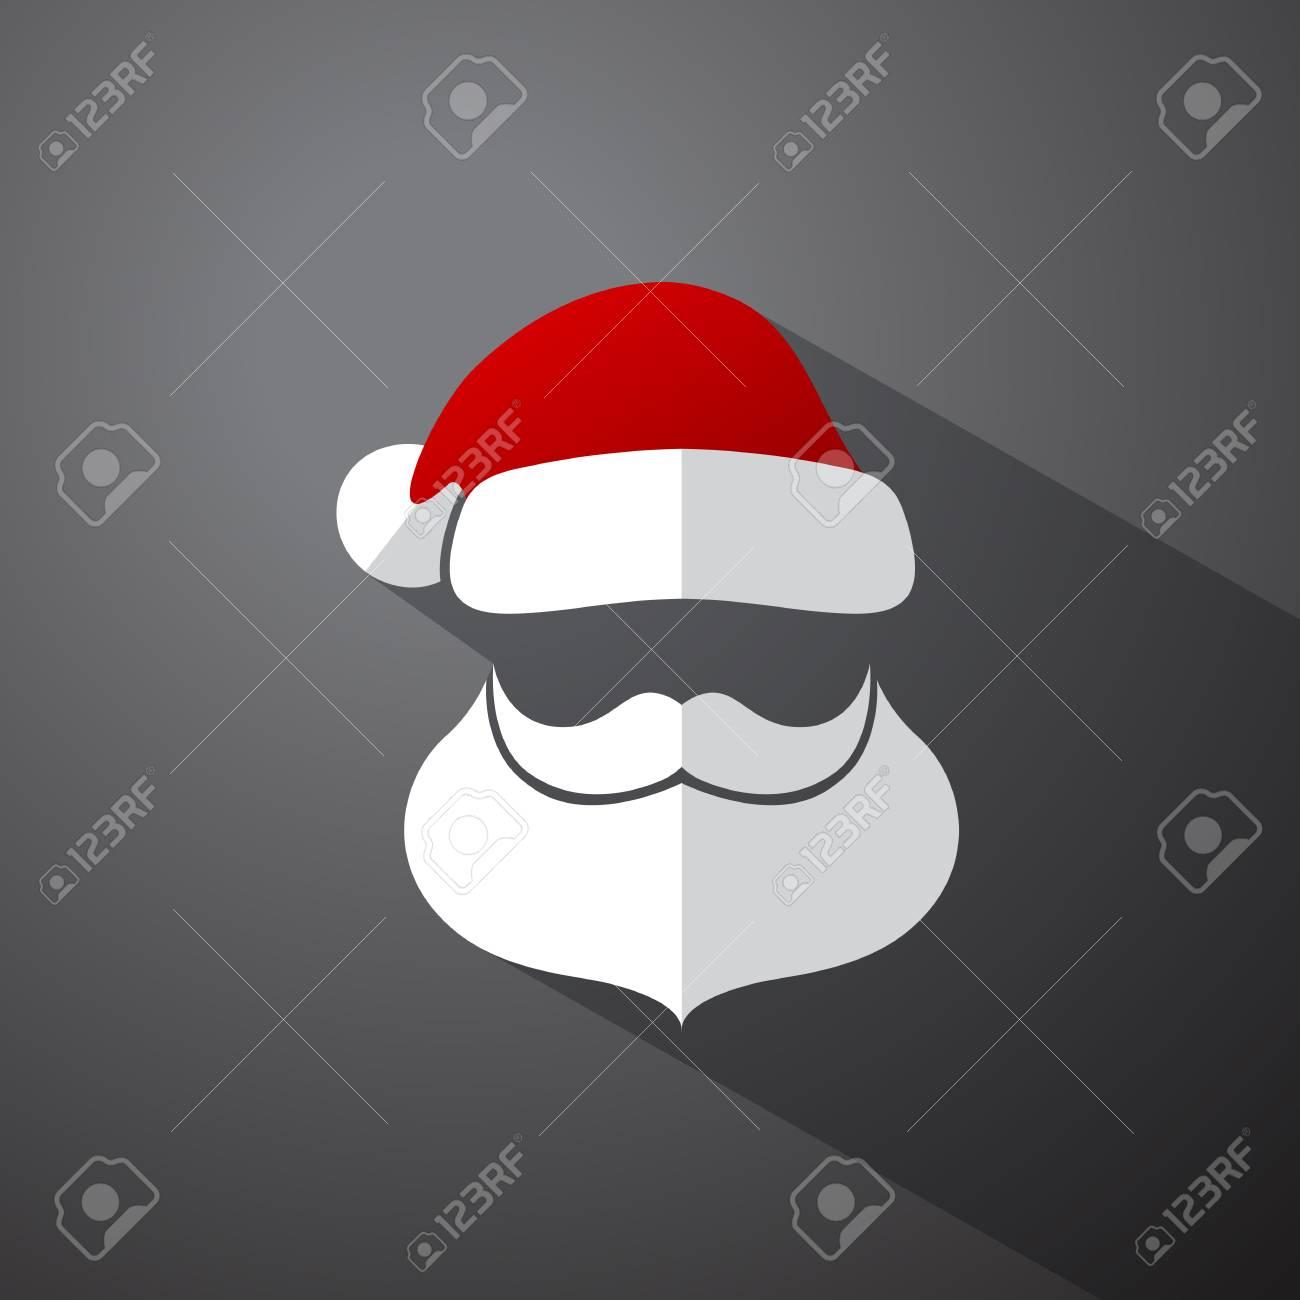 d8b21376f1e Santa Clause Simple Head With Moustache